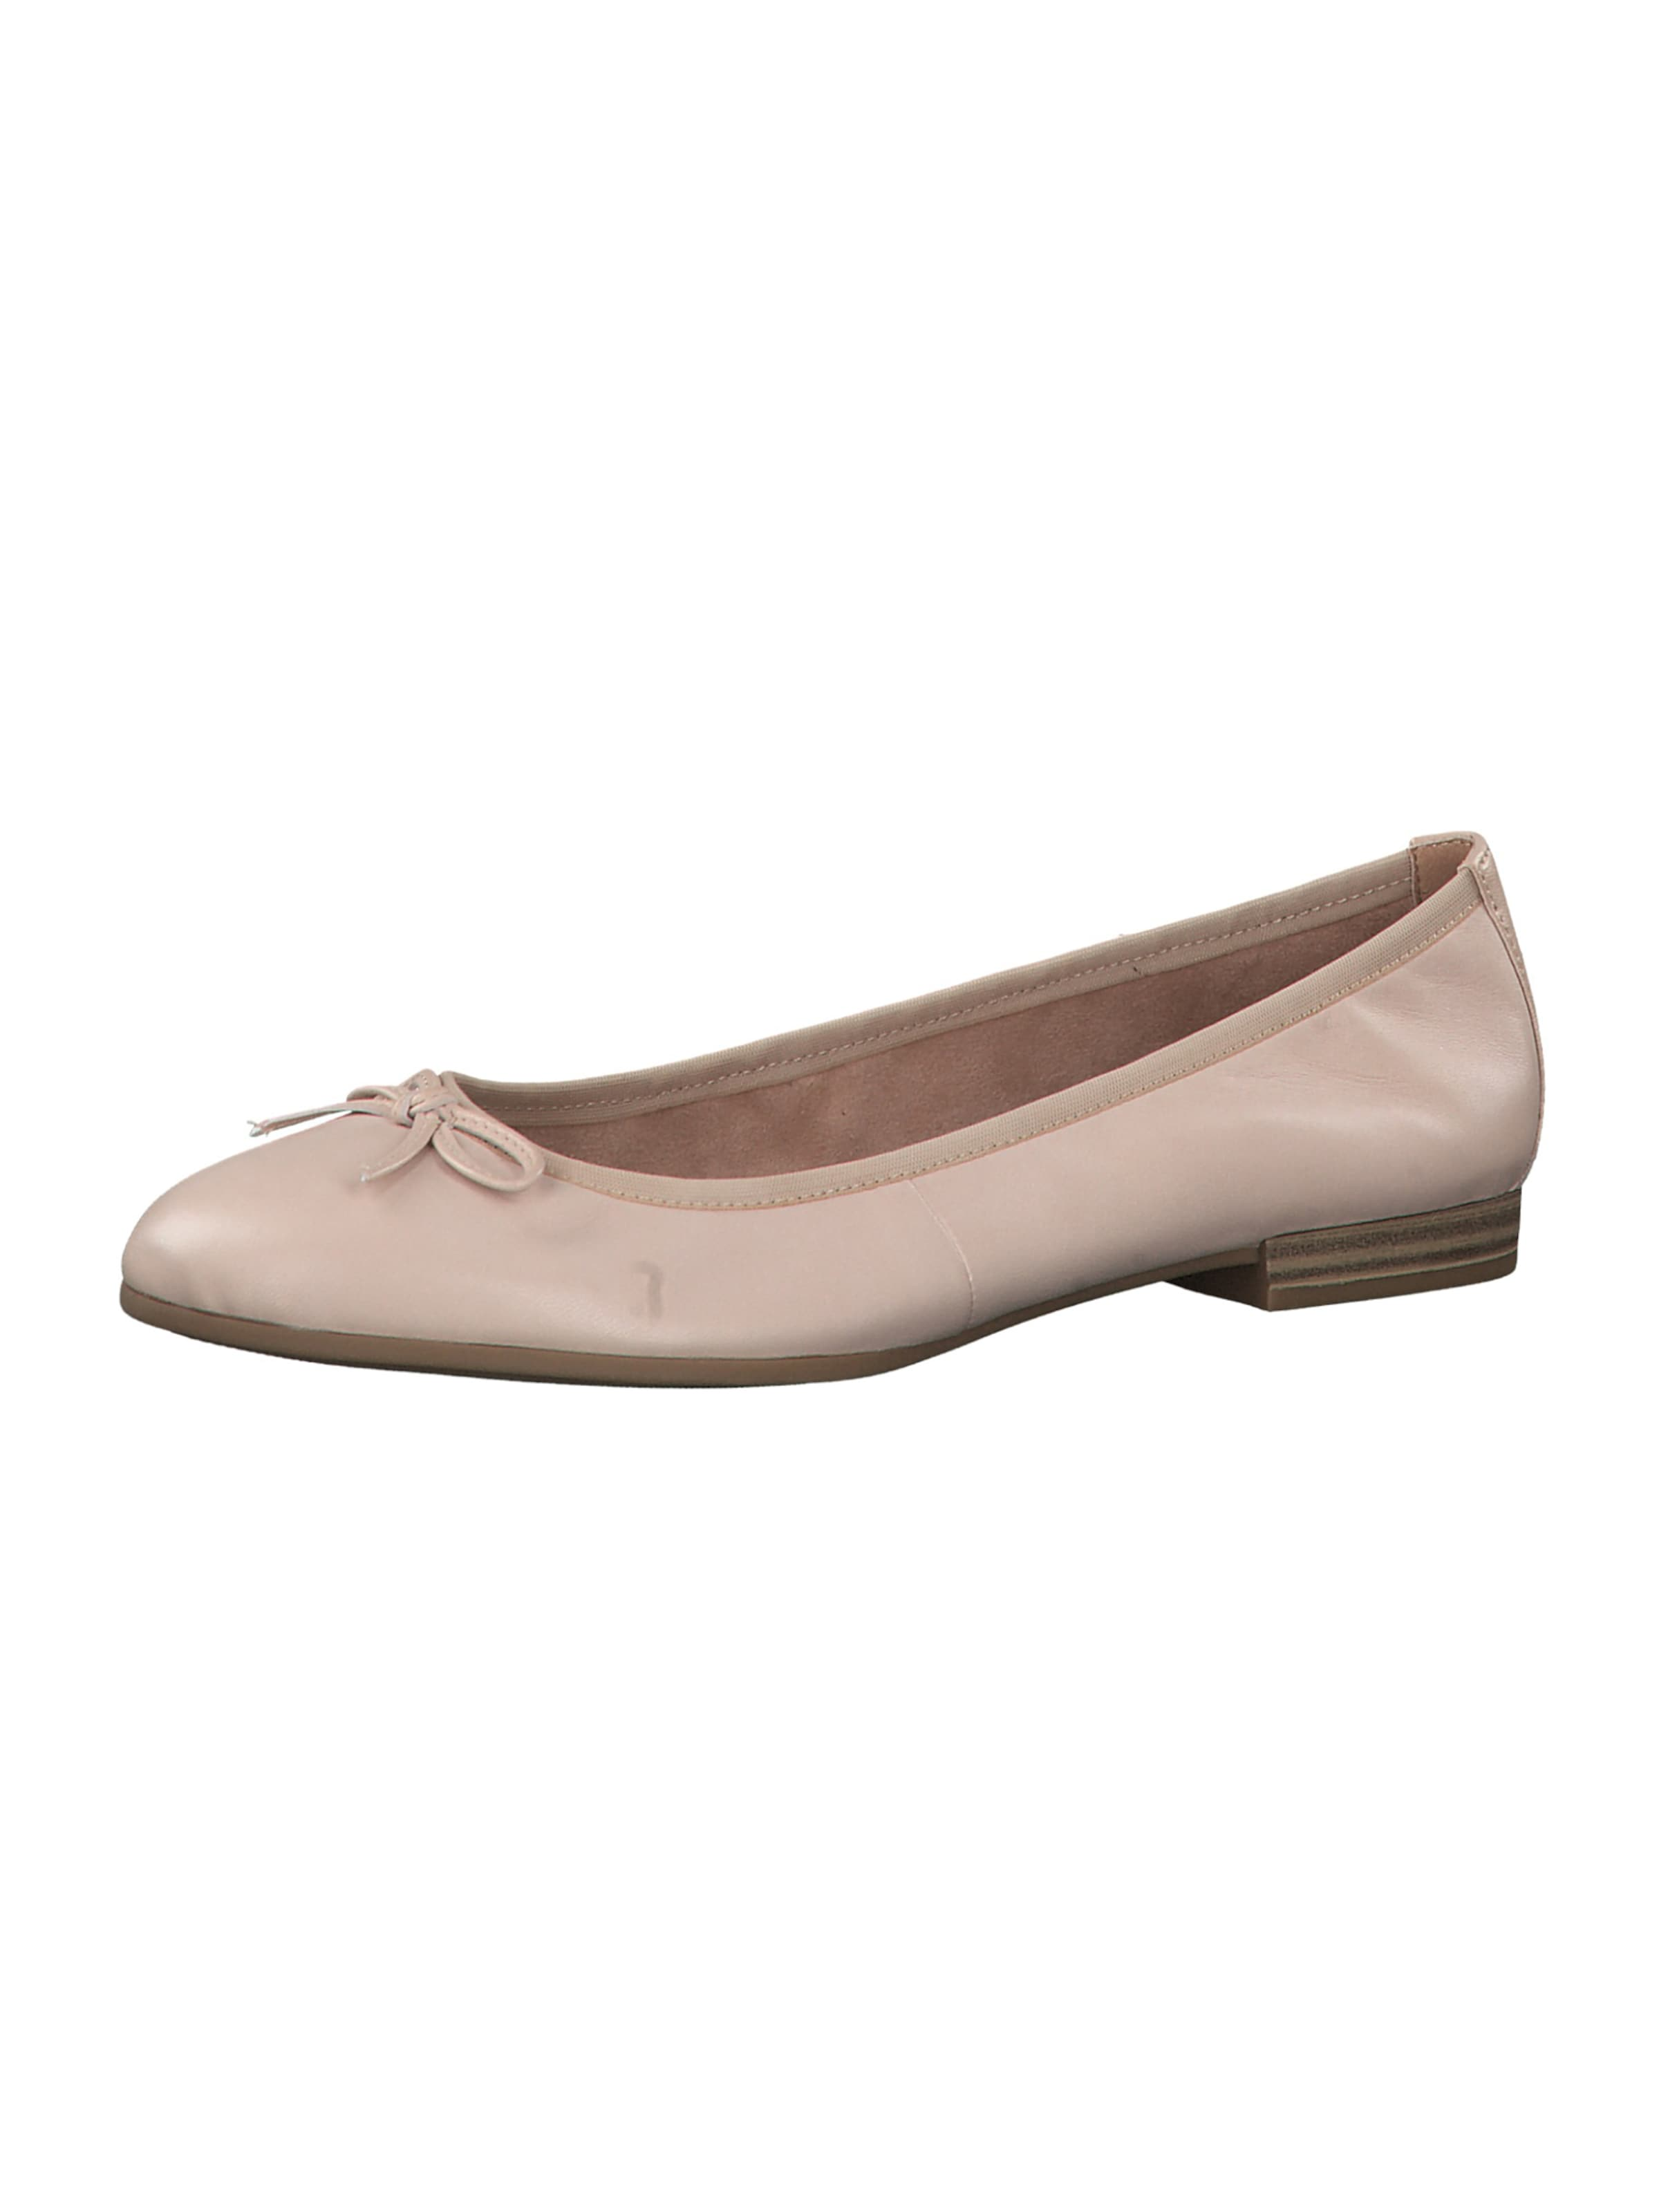 TAMARIS Ballerina in rosé